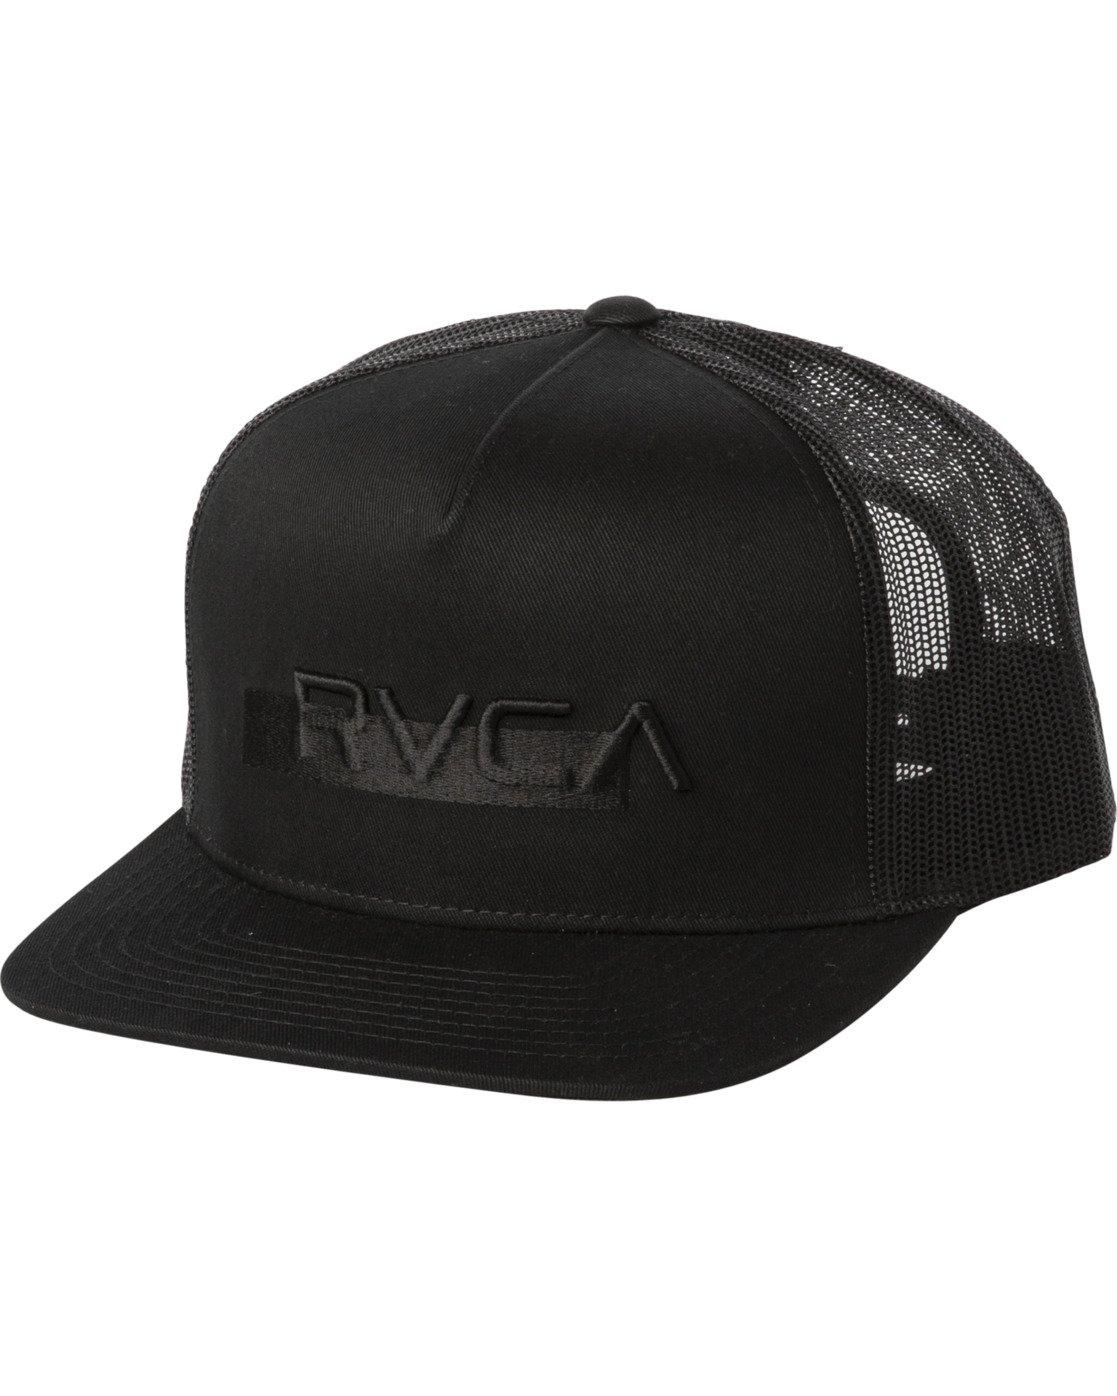 0 OVERLAY TRUCKER Black MAHW3ROT RVCA